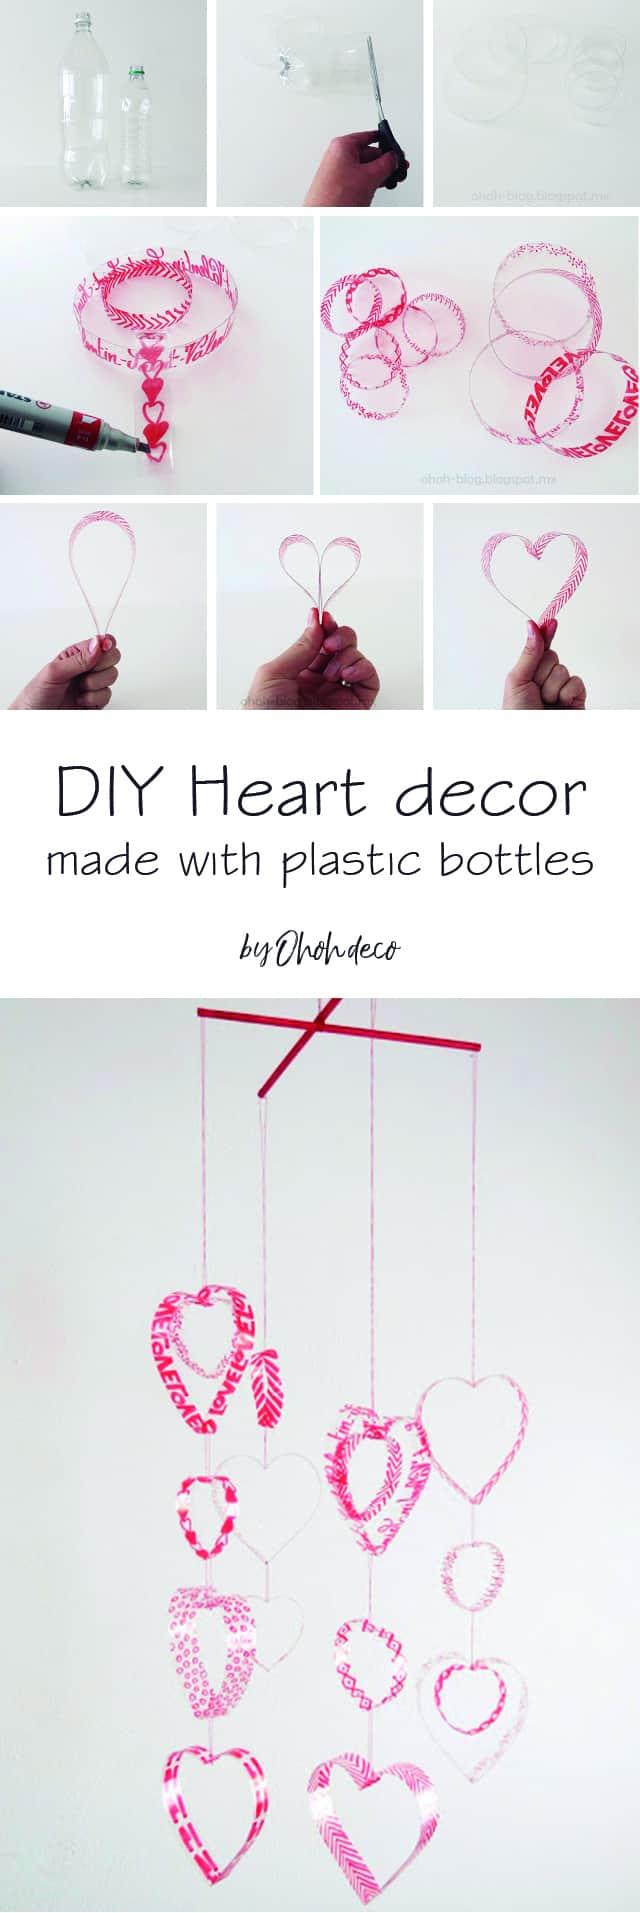 Easy DIY Valentine's day decor